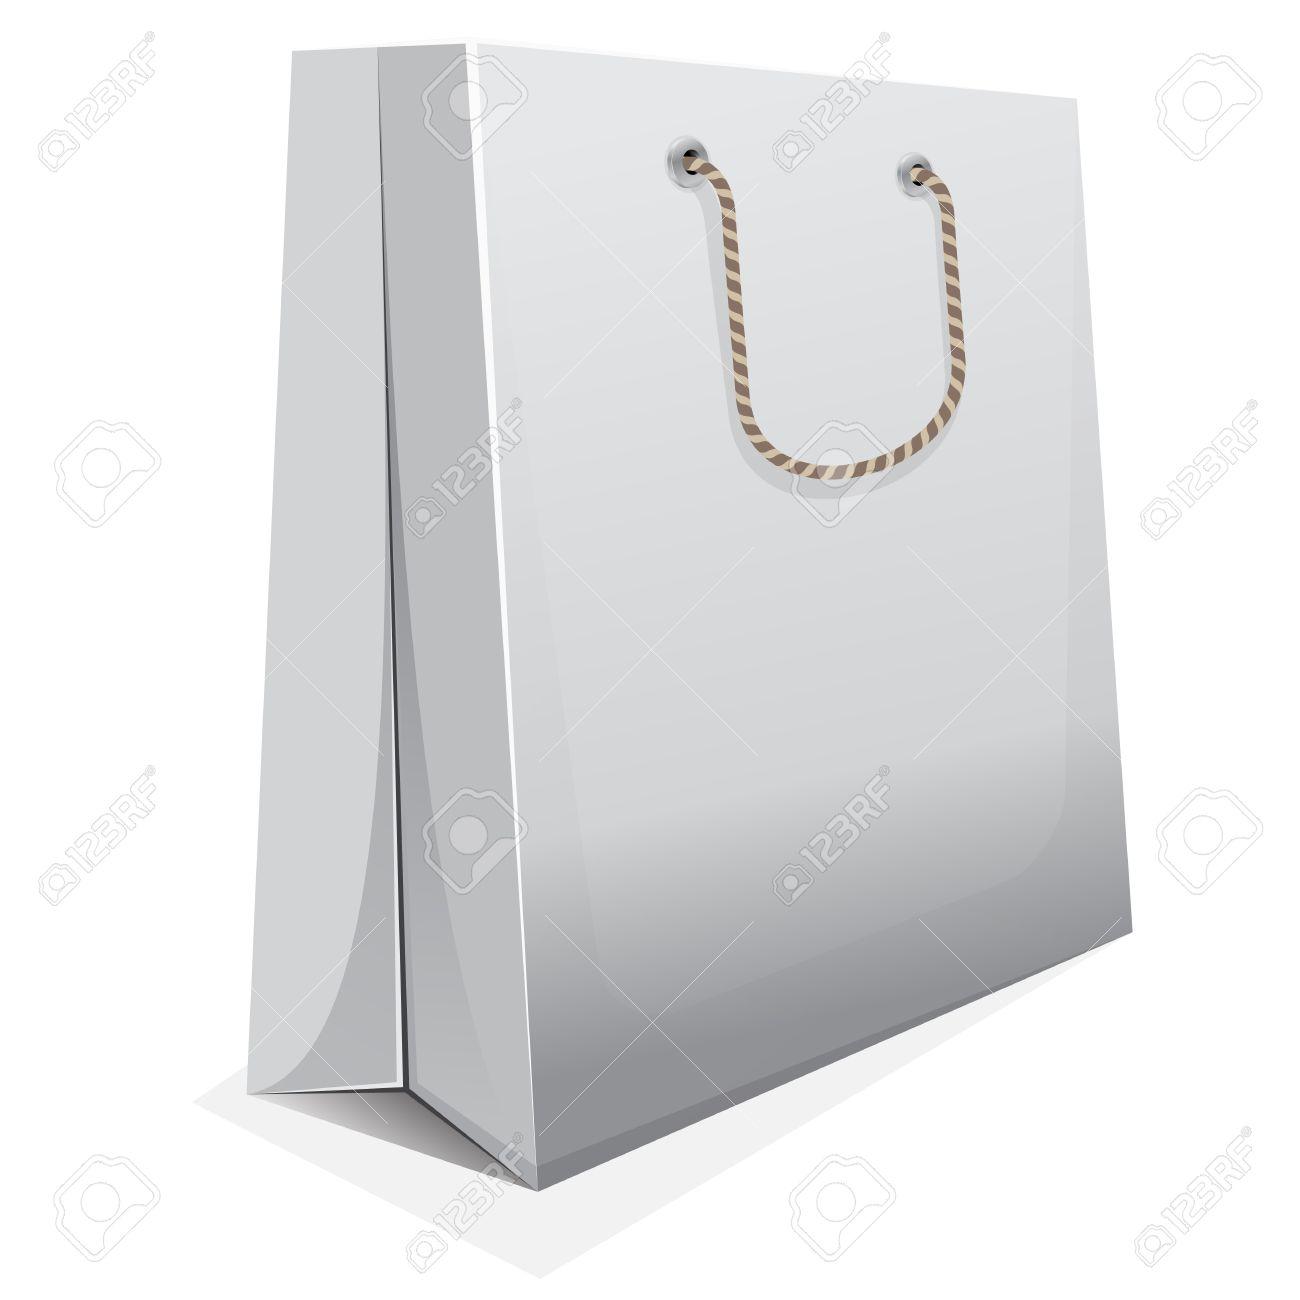 White Shopping Bag Black Handle White Blank Shopping Bag With